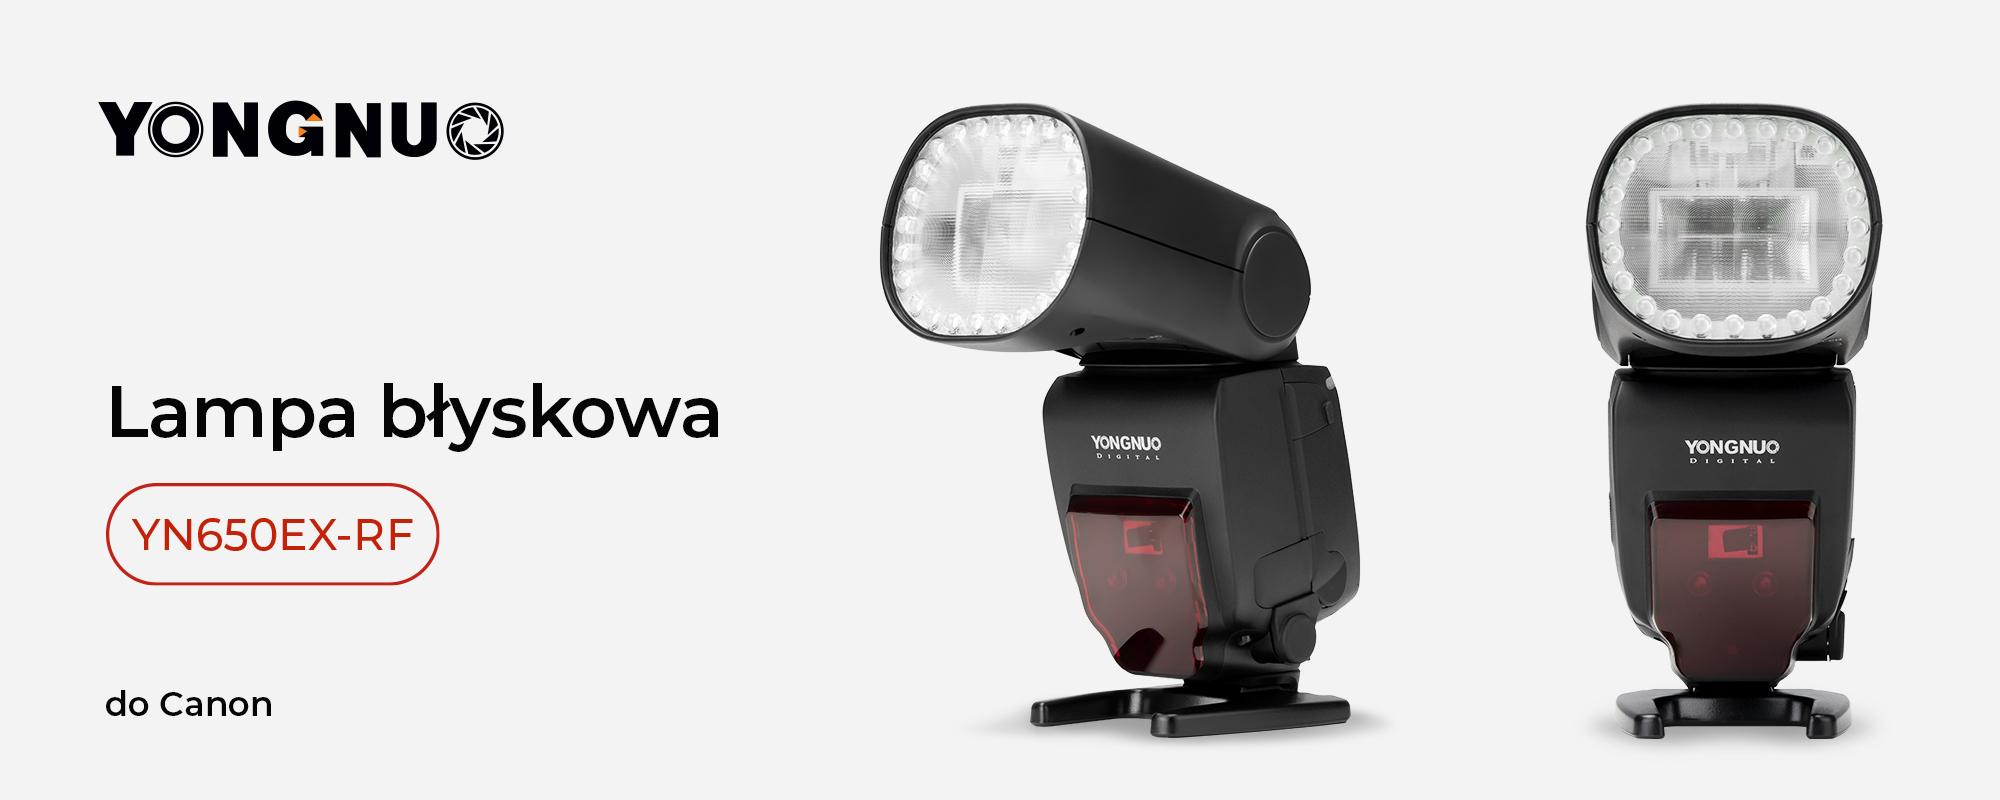 Lampa błyskowa Yongnuo YN650EX-RF do Canon